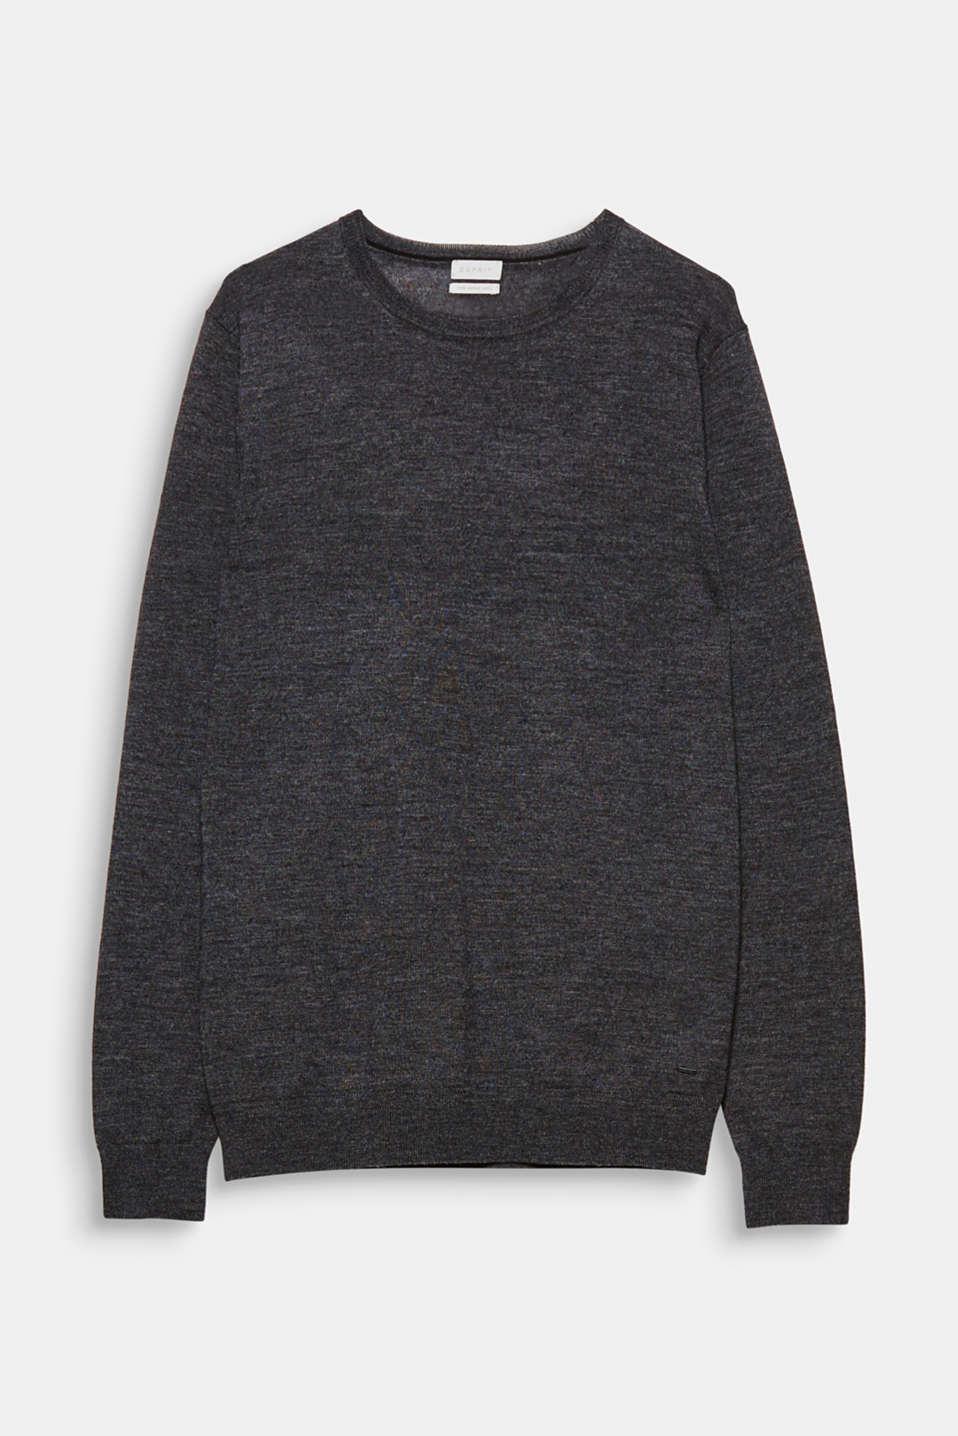 Esprit pull over en fine maille 100 laine acheter - Acheter laine xxl ...